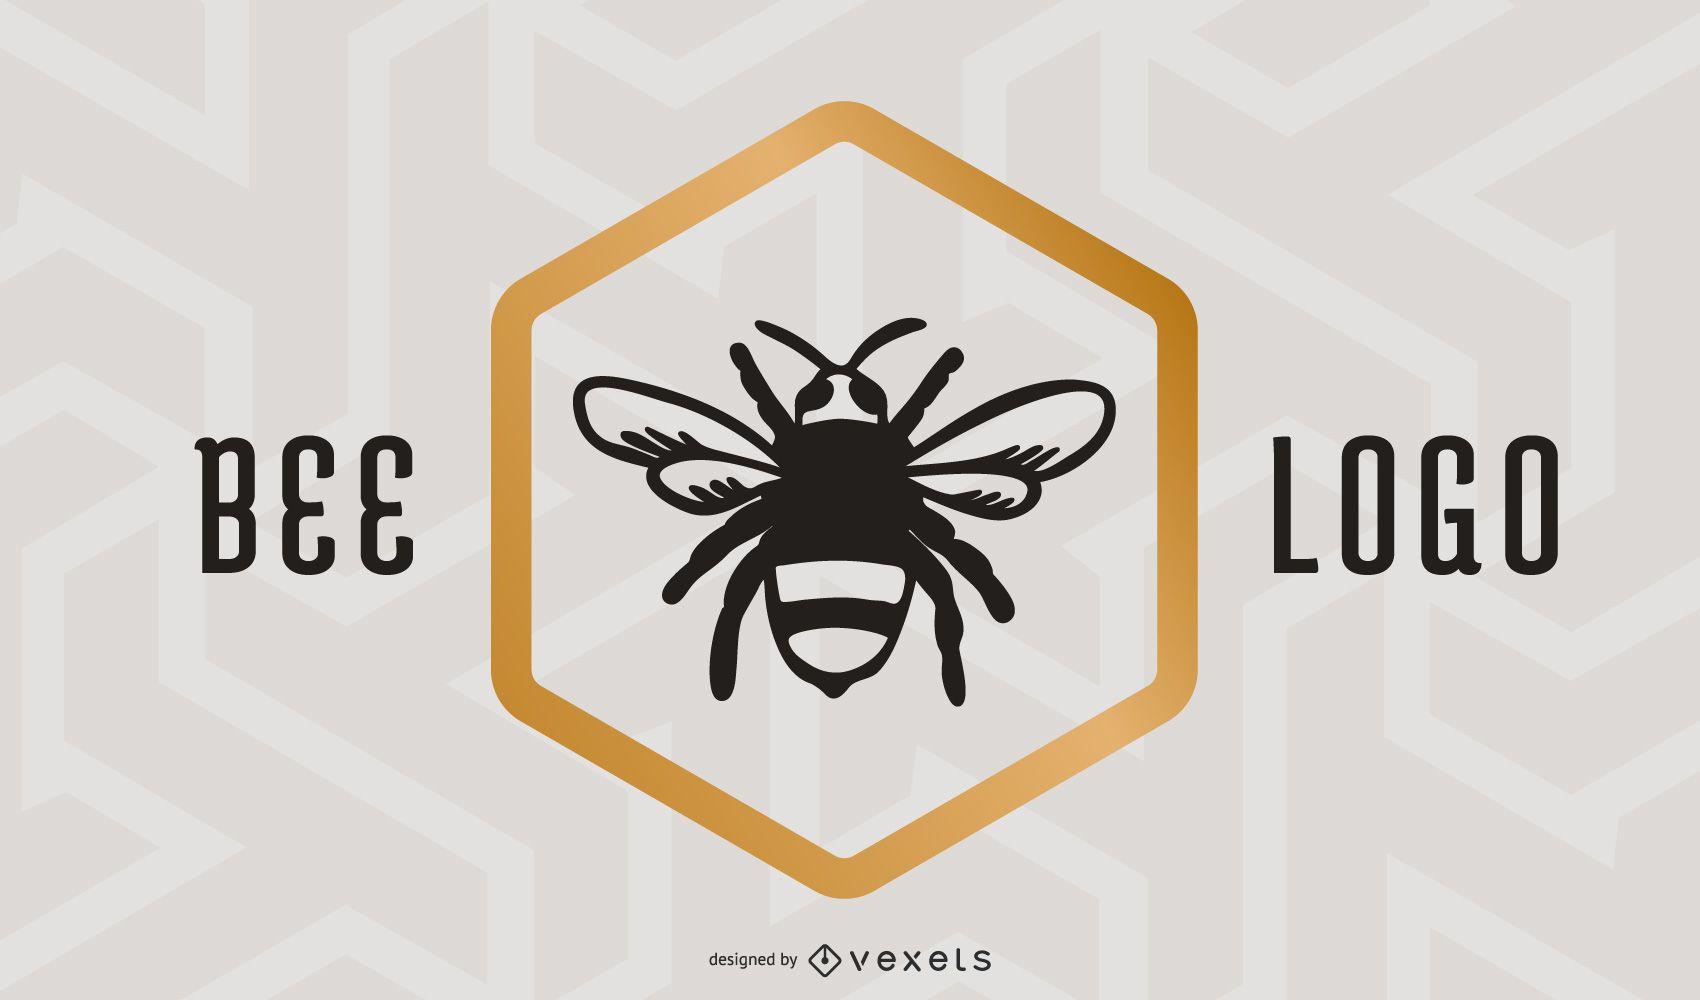 Logotipo de abeja gratis negro dorado